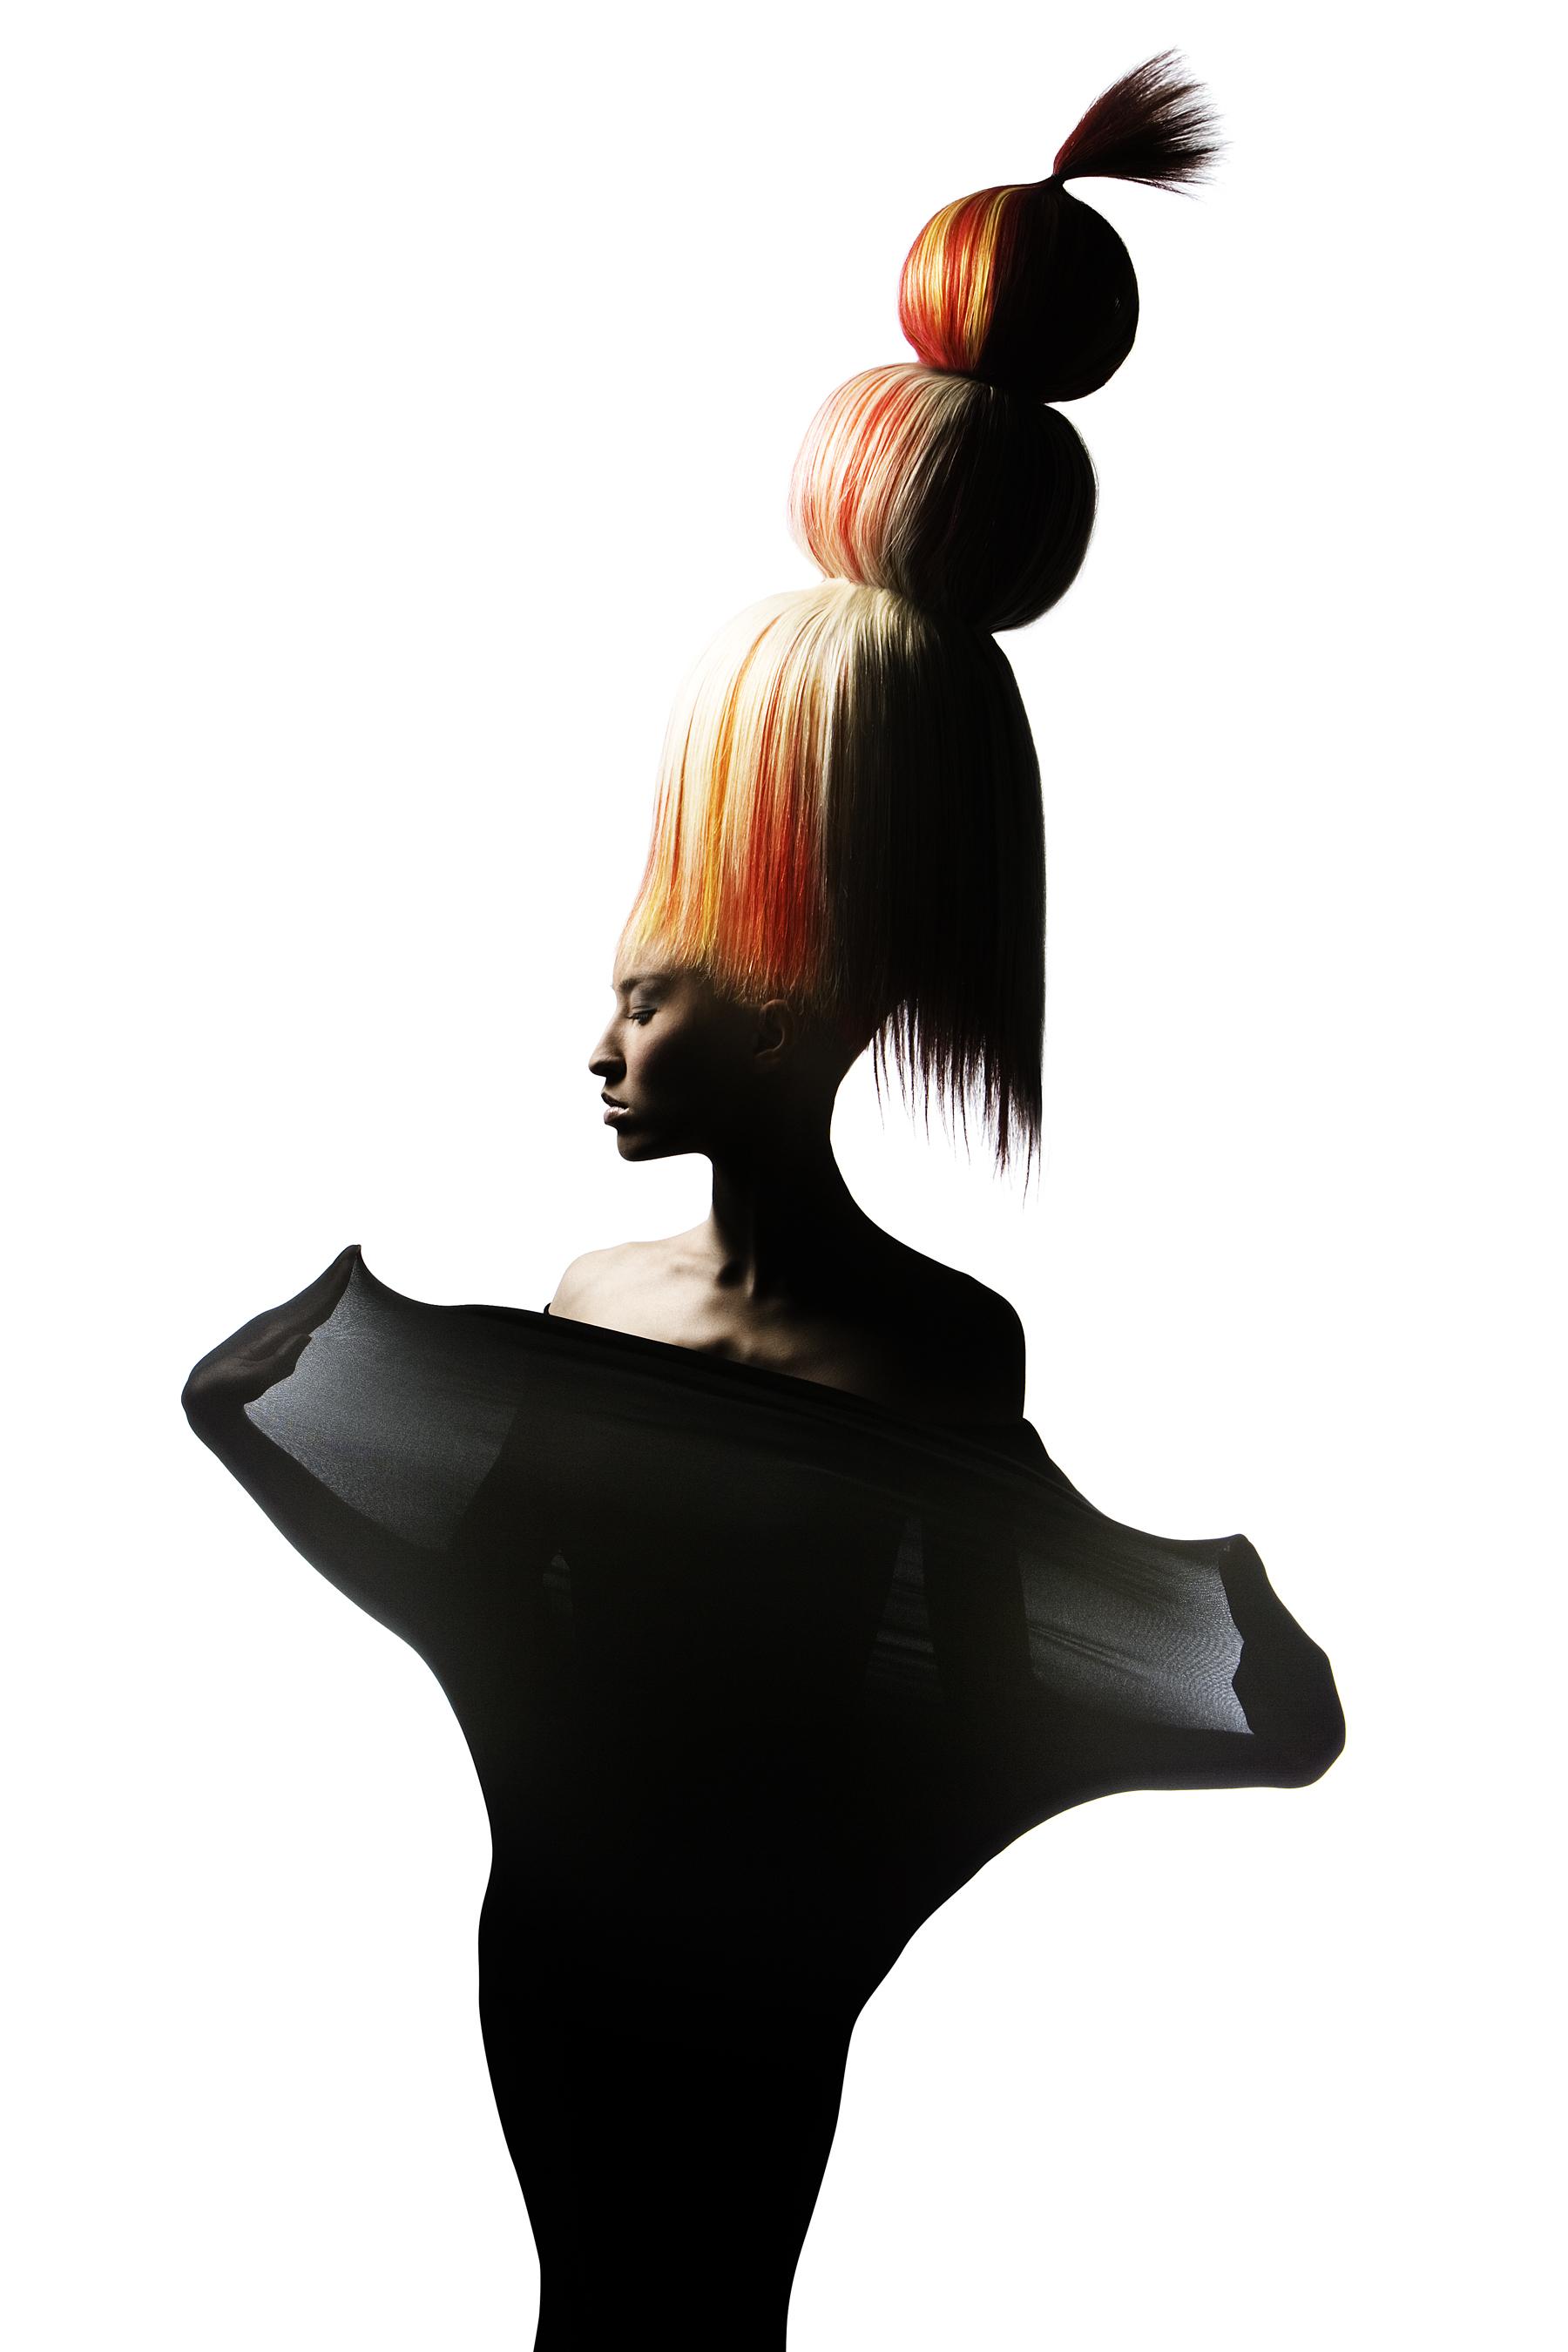 1800x2700 North American Hairstyling Awards (Naha)